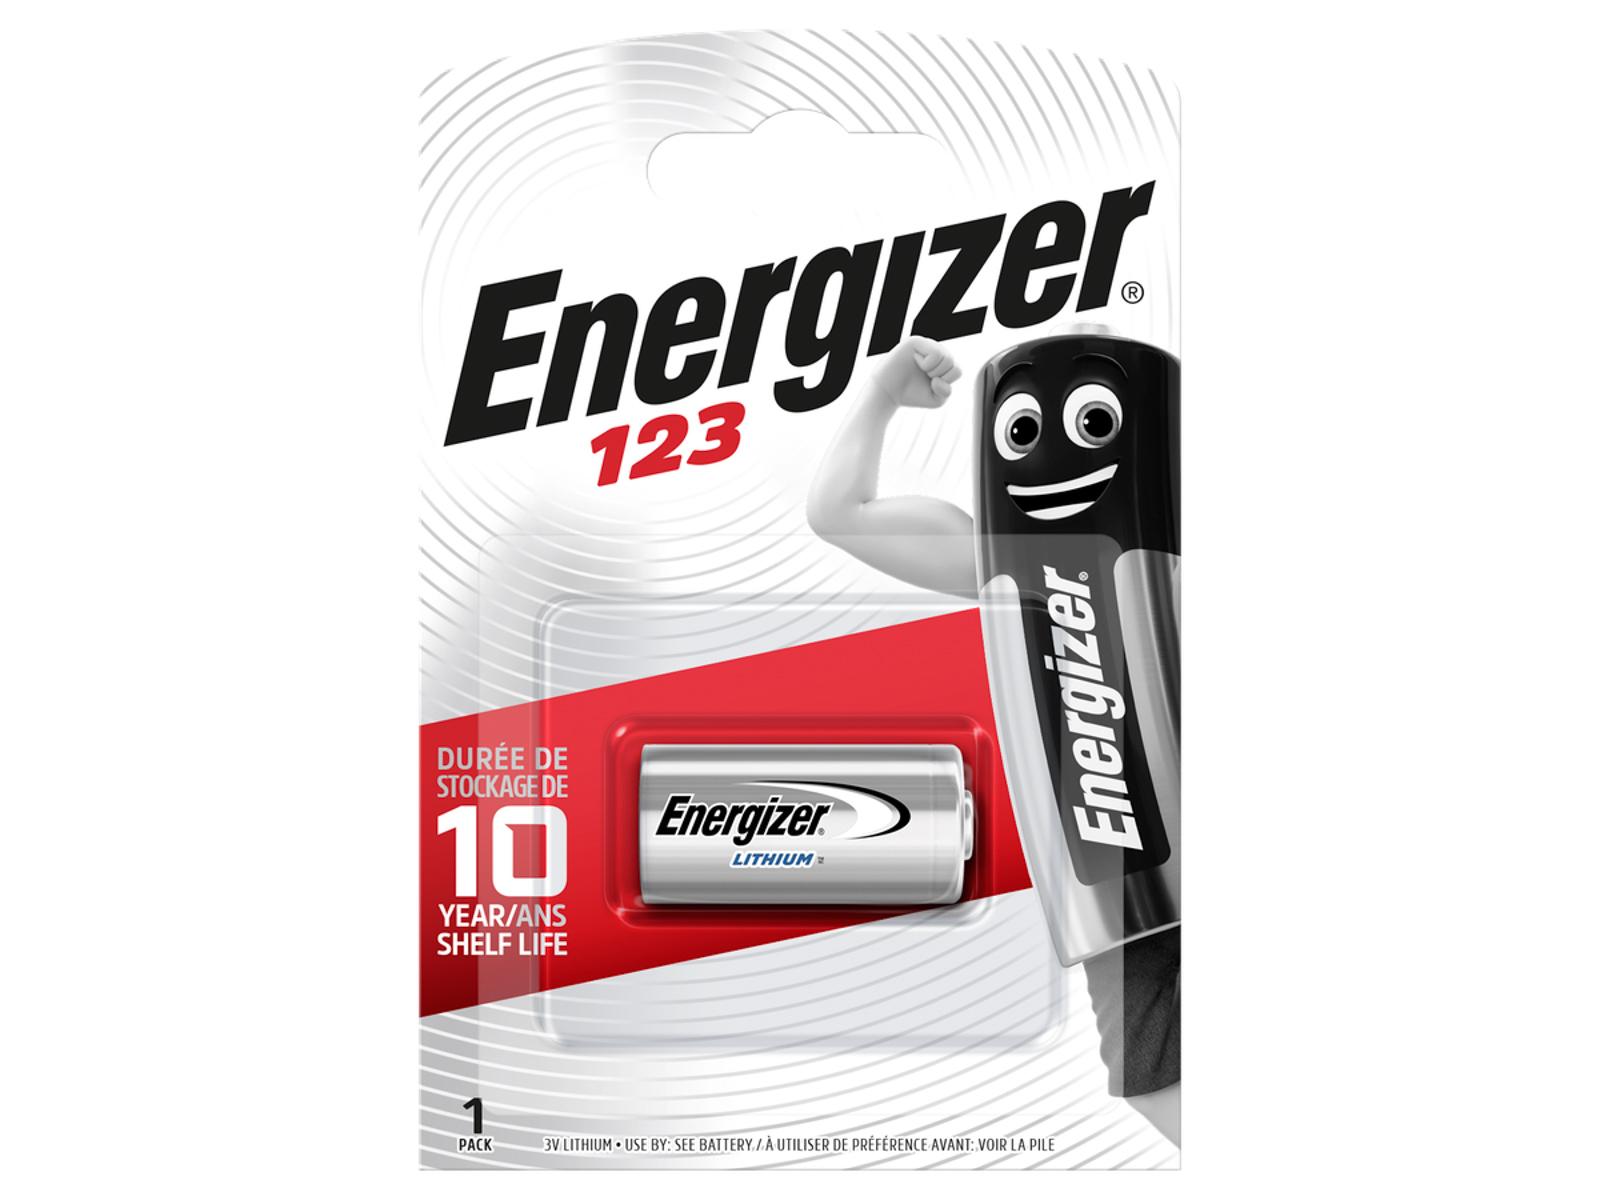 Energizer 123 Lithium 3.0V